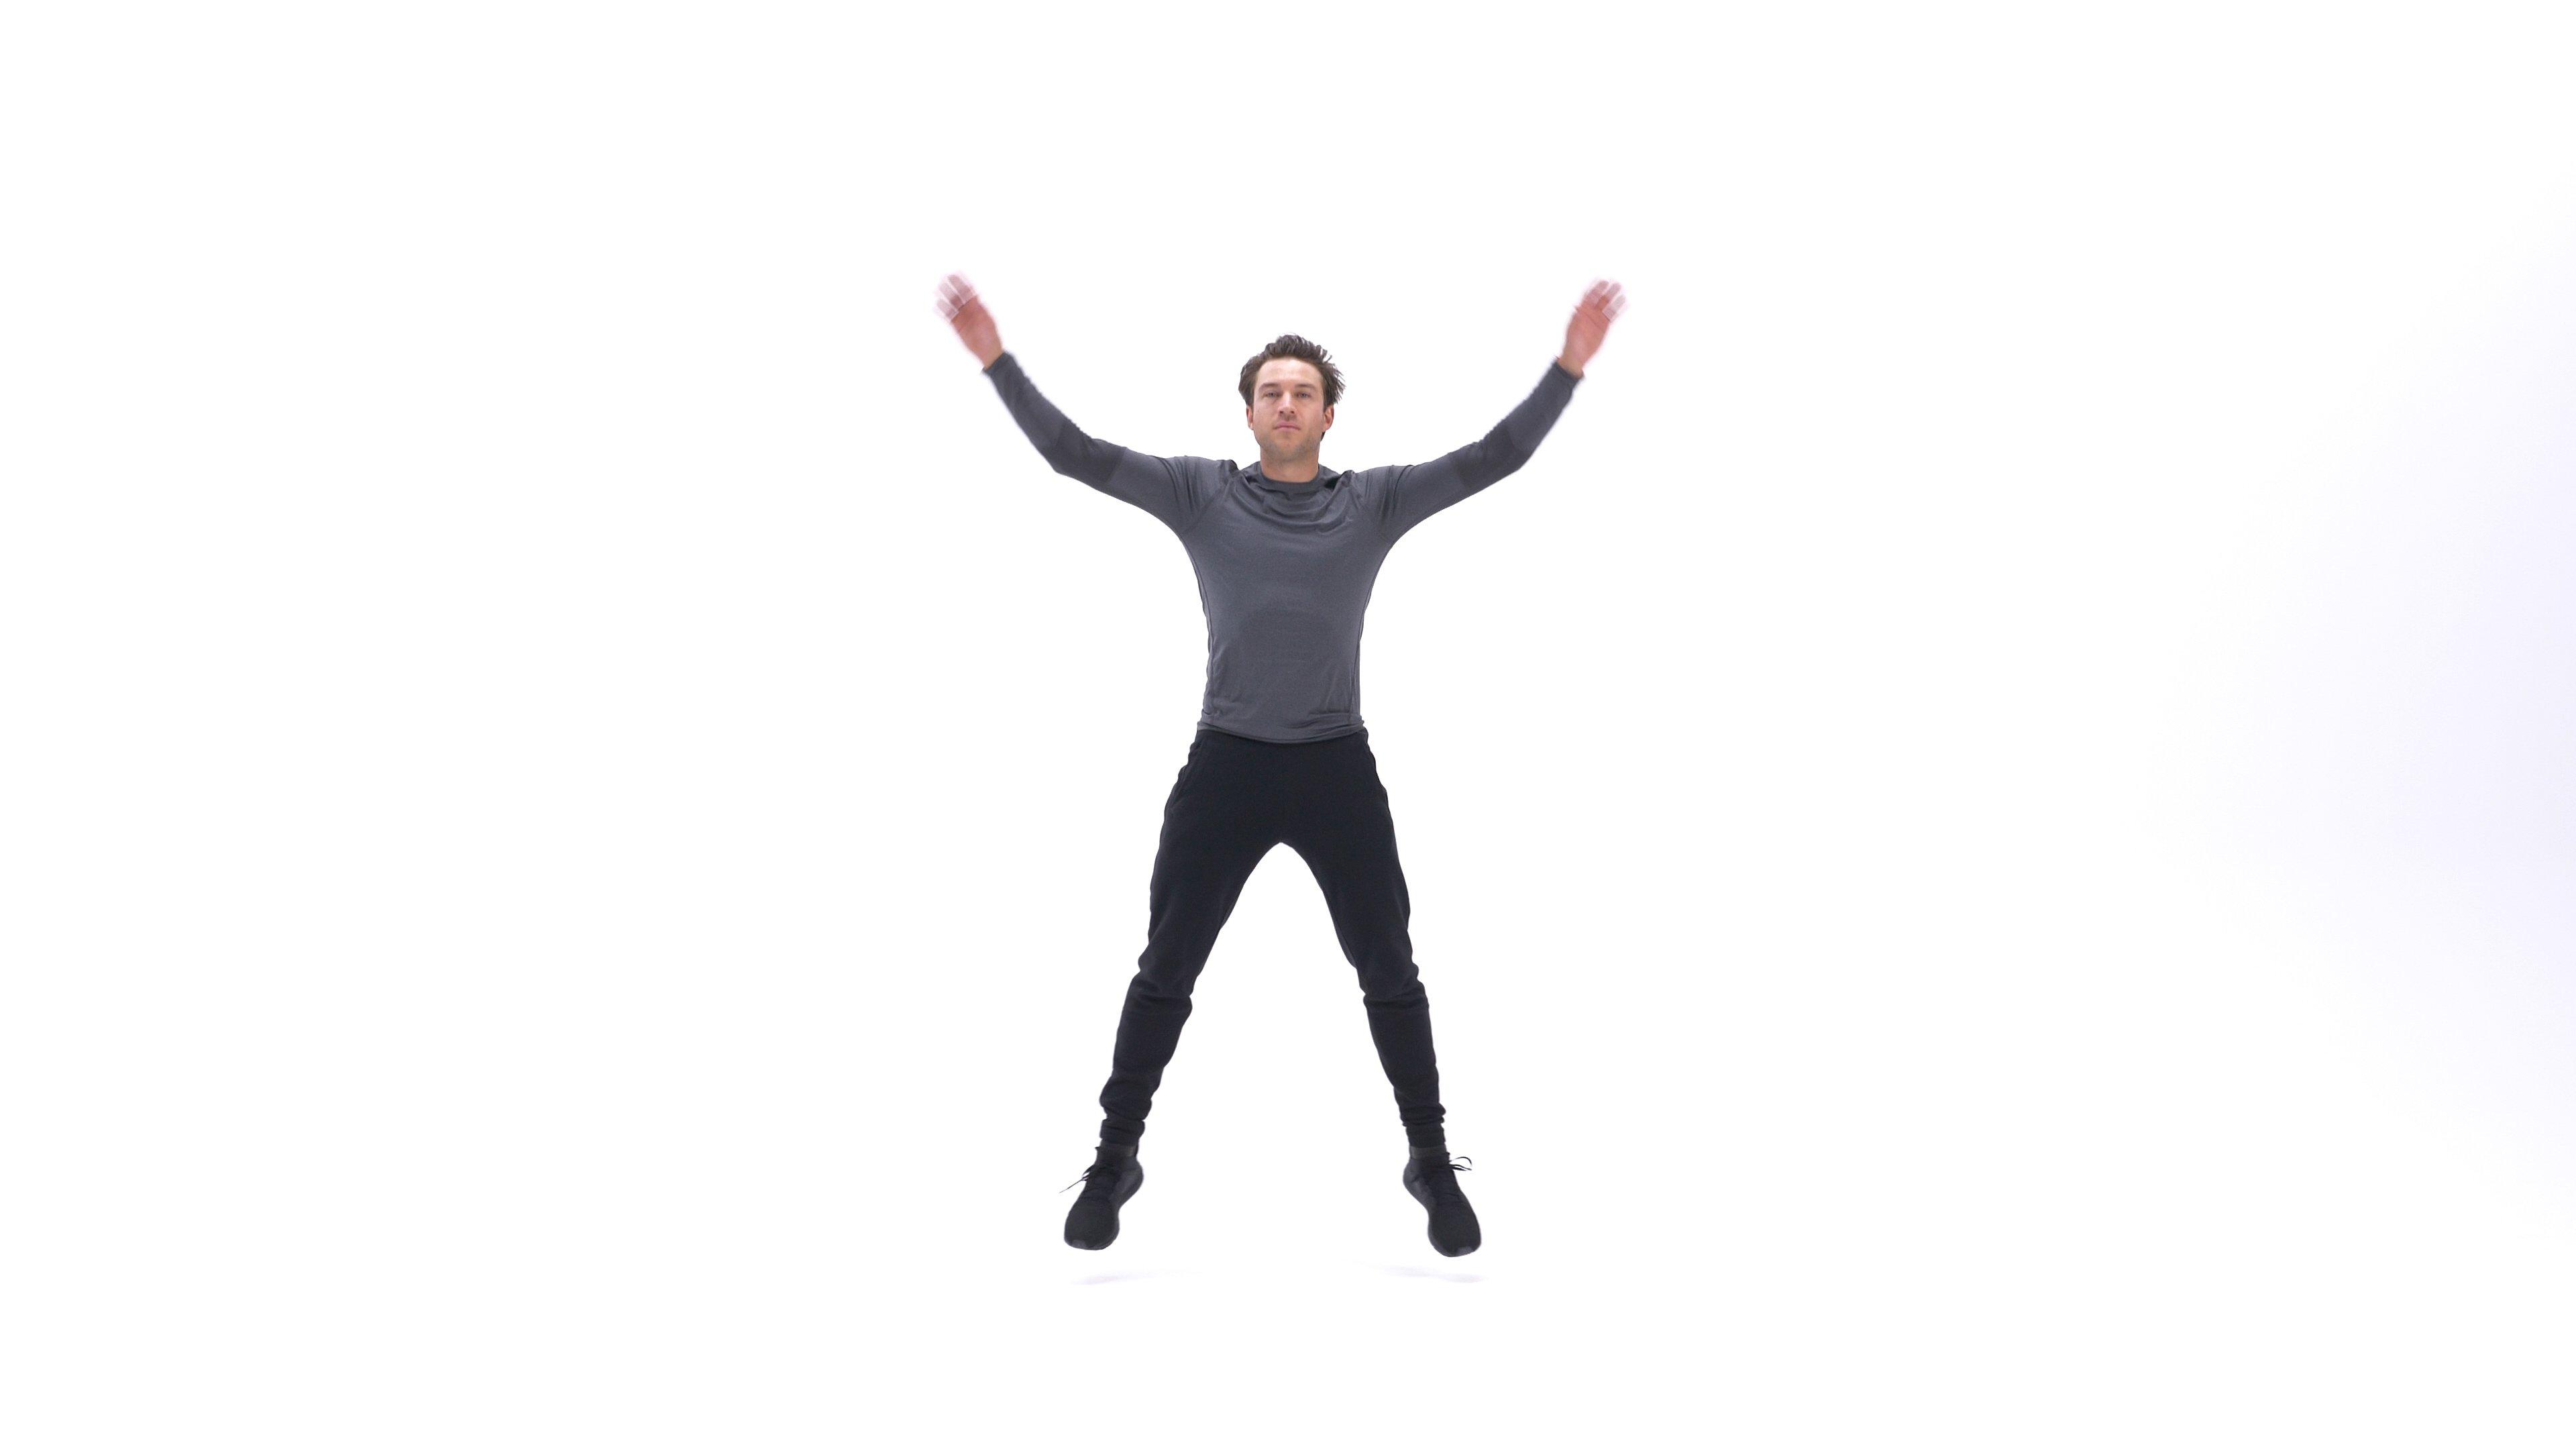 Jumping Jack image